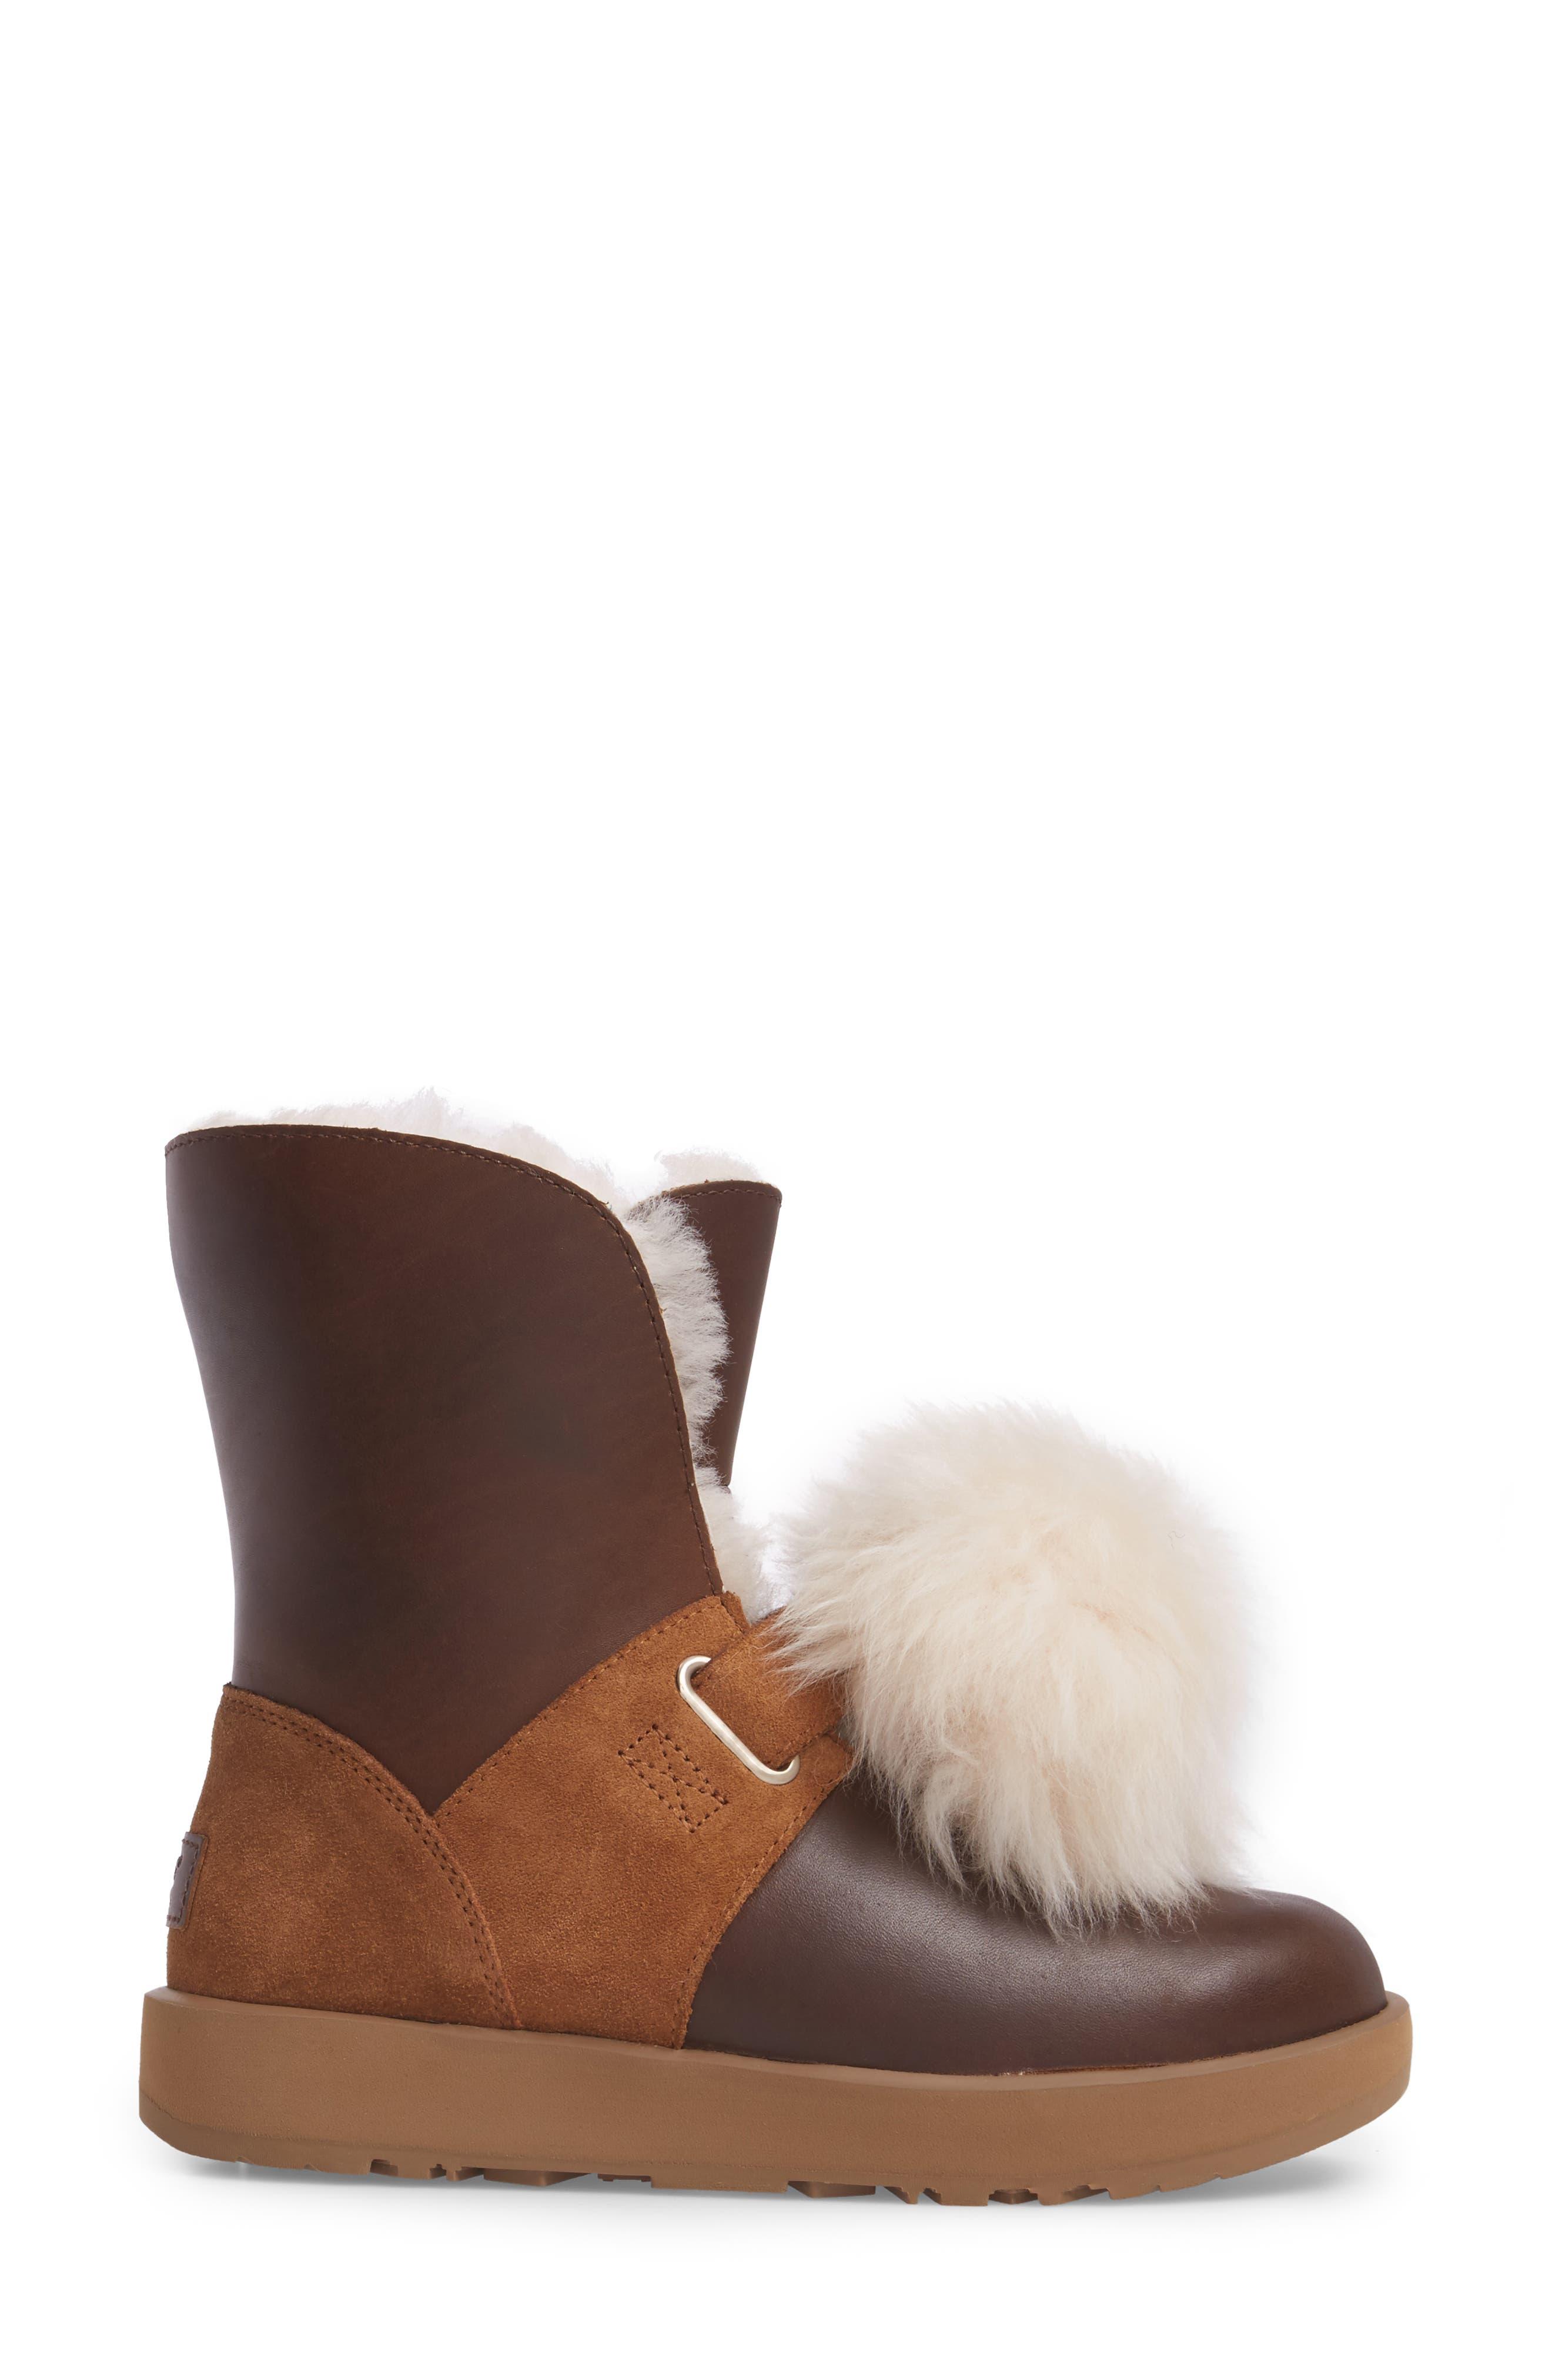 Alternate Image 3  - UGG® Isley Genuine Shearling Pompom Waterproof Boot (Women)